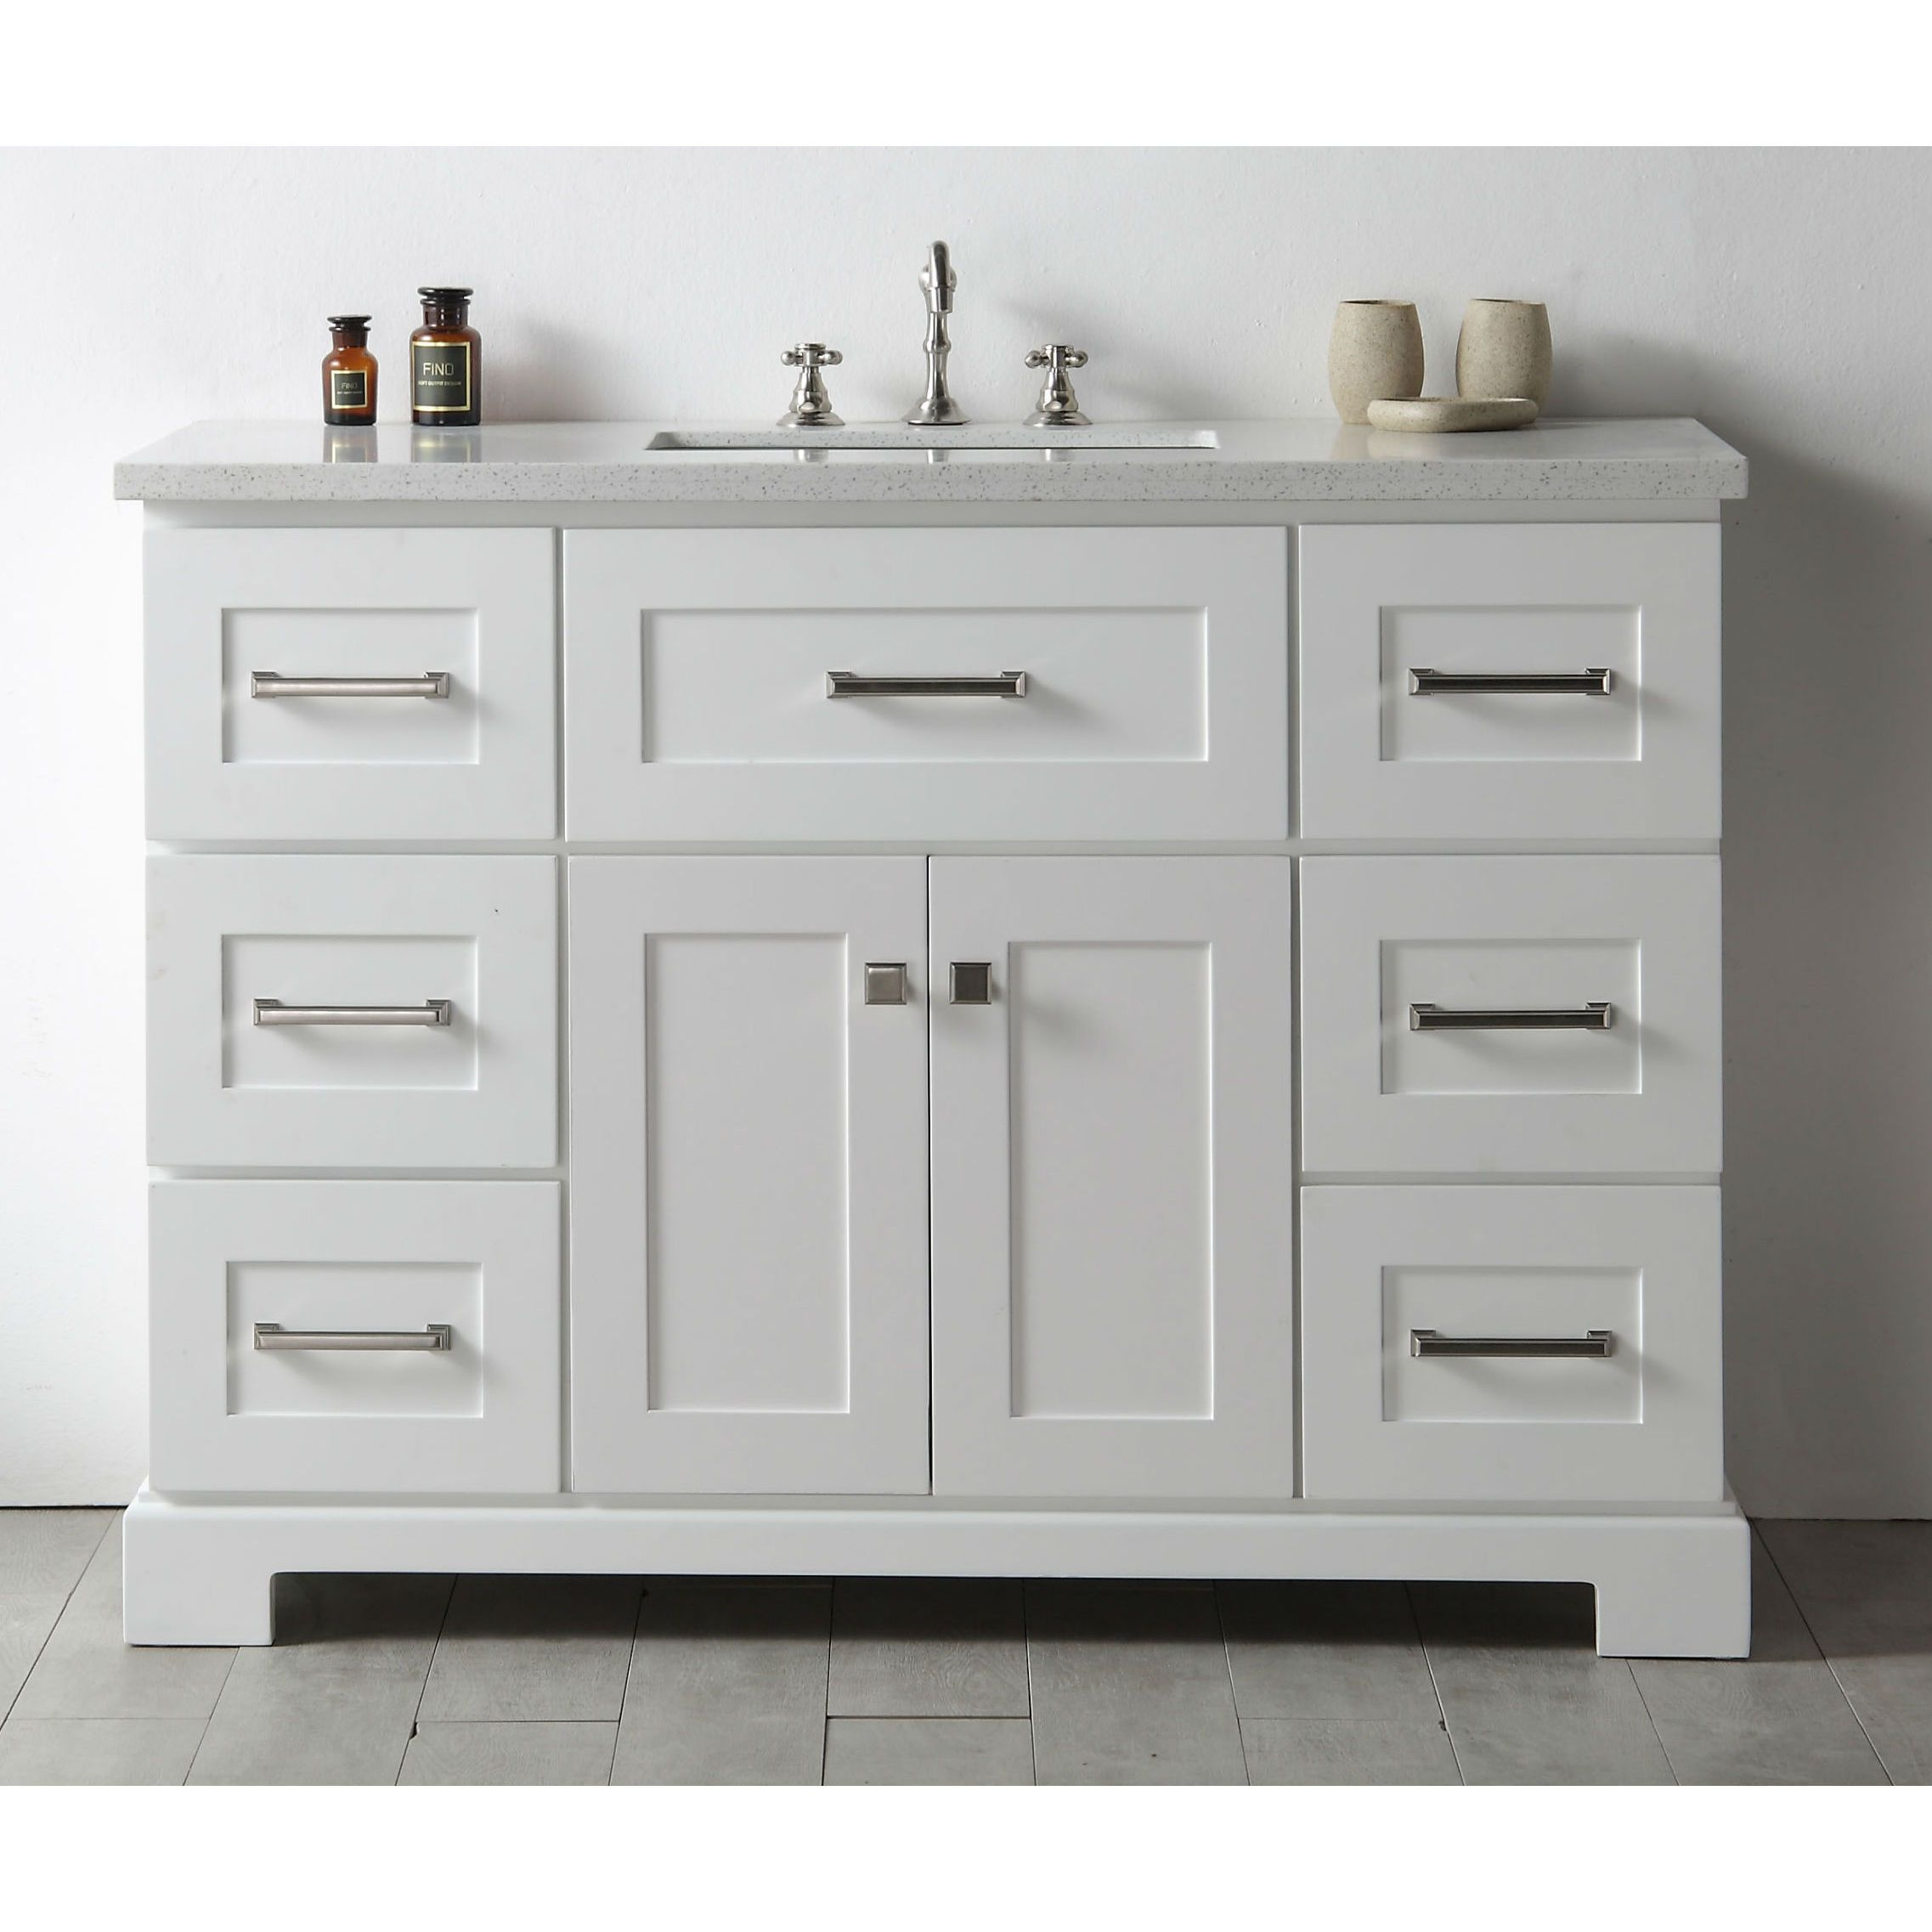 Legion Quartz Top White 48-inch Single Bathroom Vanity | Single ...